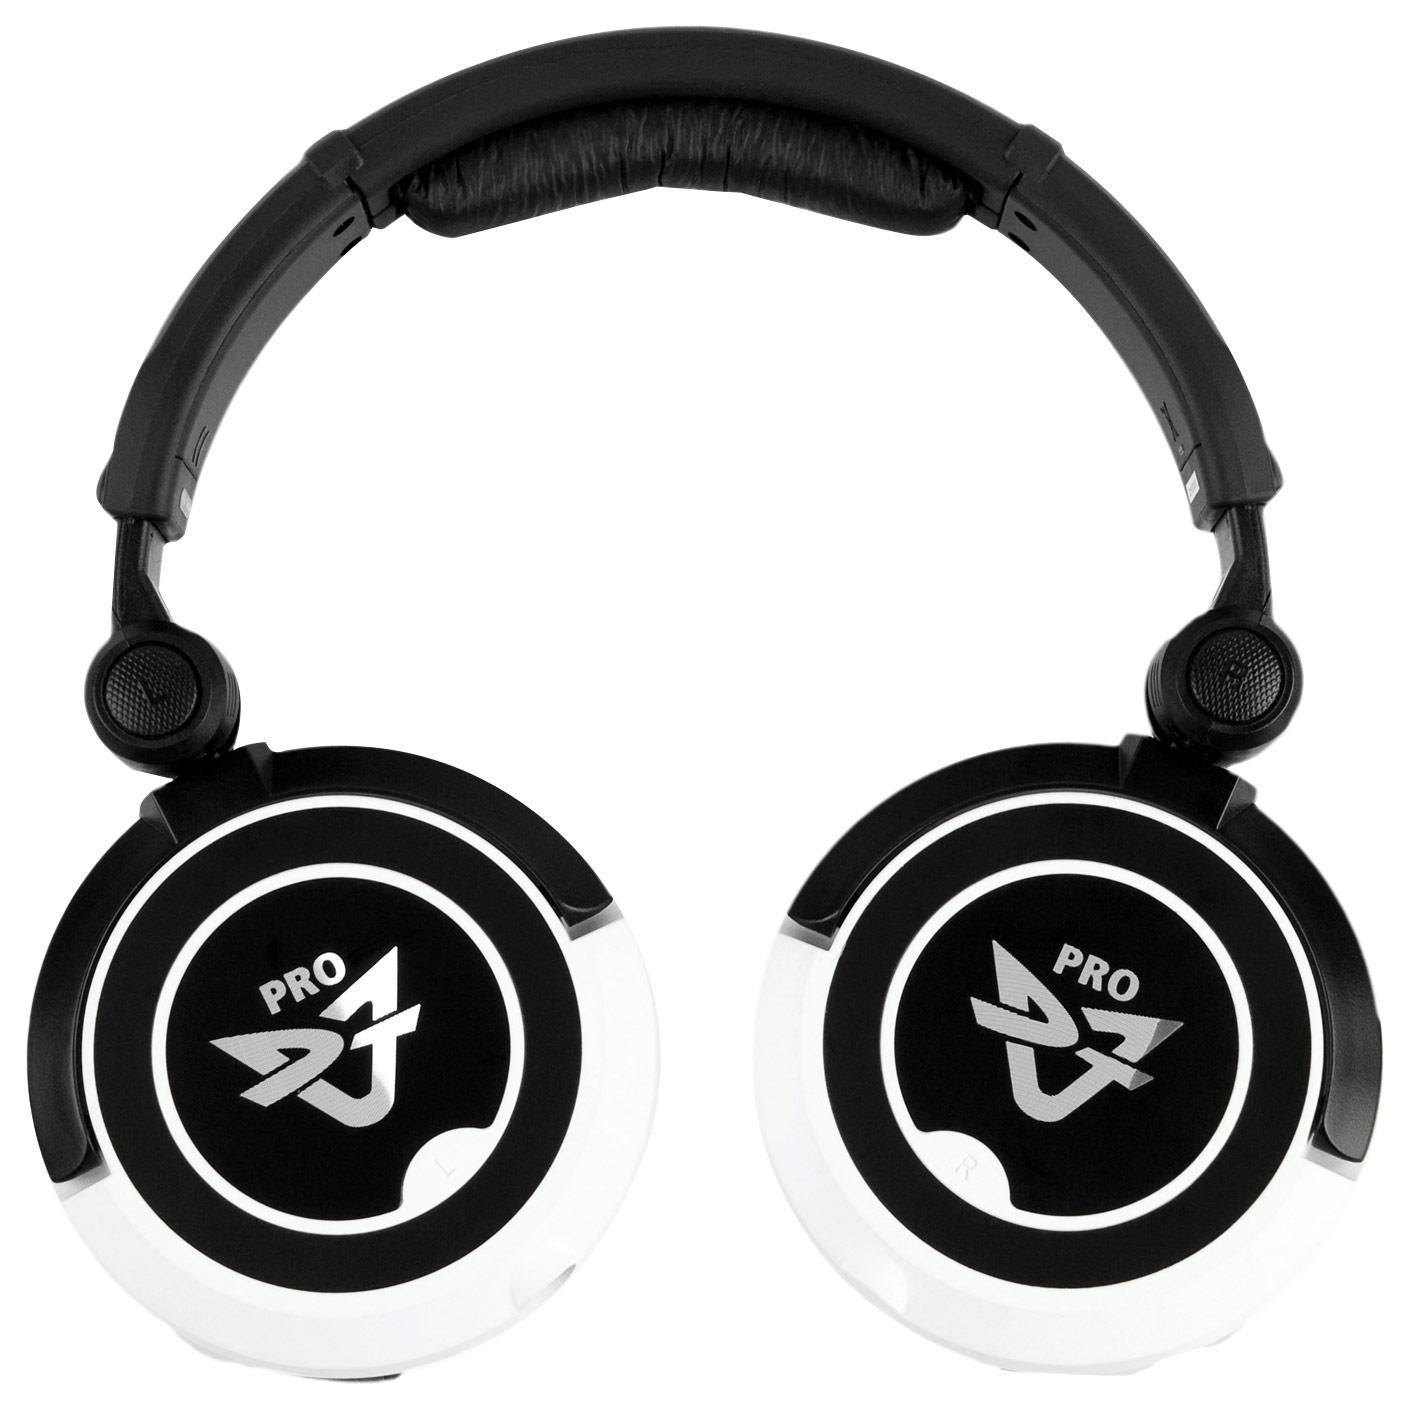 Ultrasone DJ1 PRO Over-the-Ear Headphones White/Black ULR DJ1 PRO